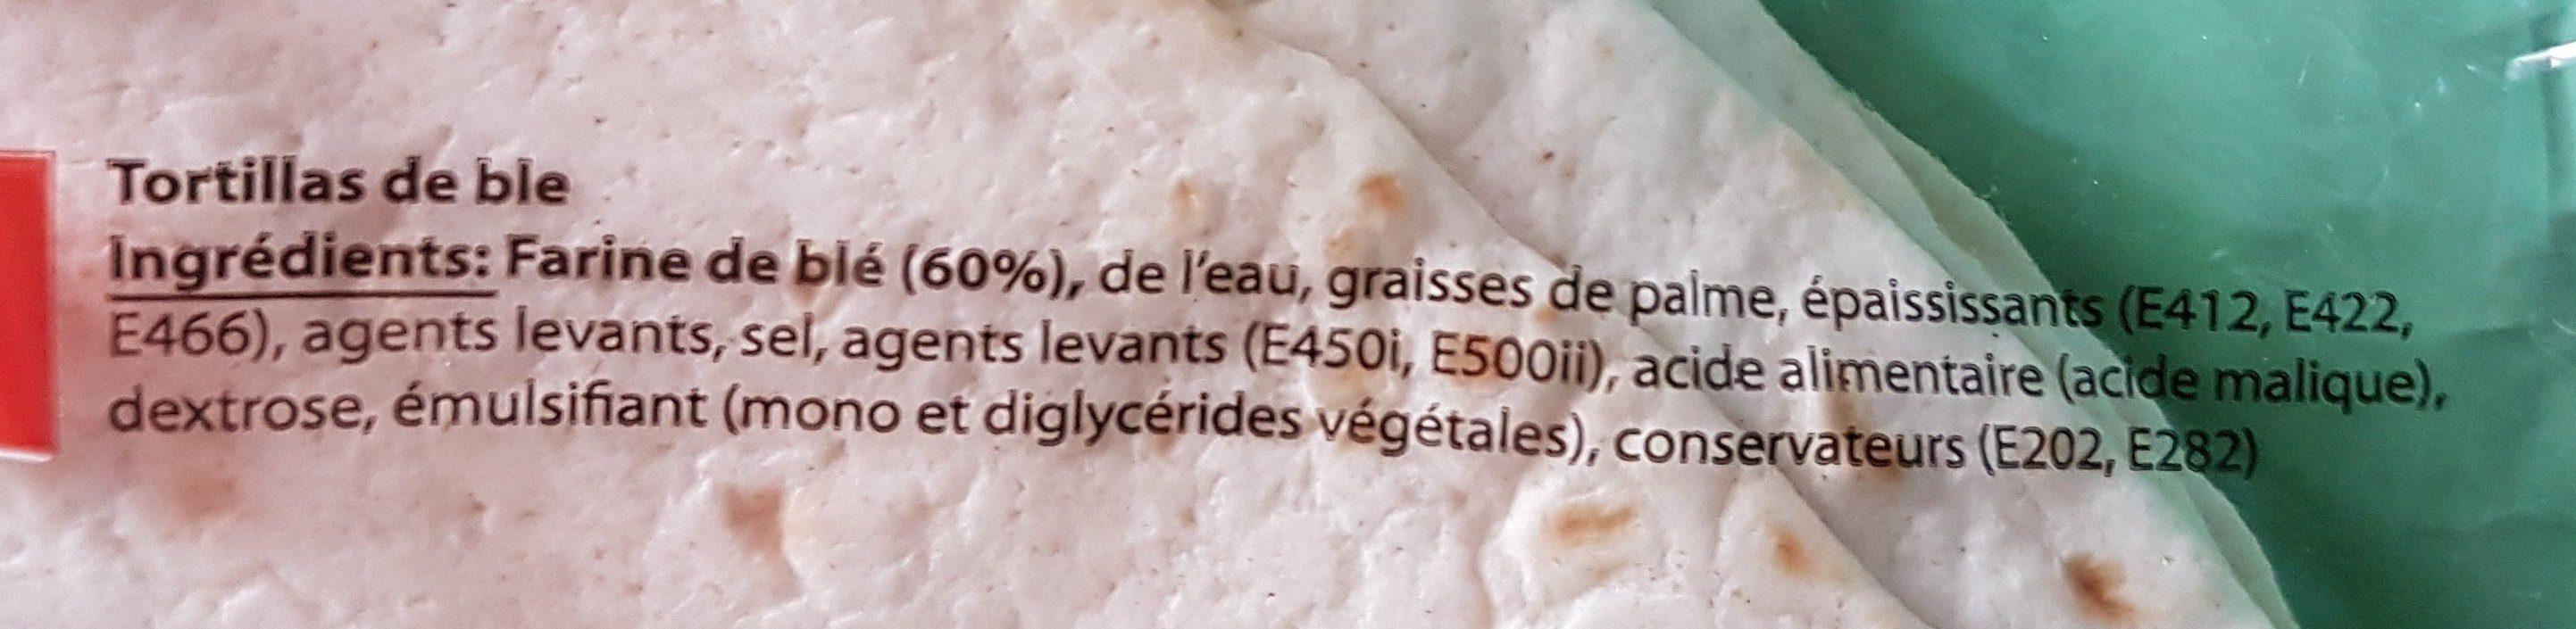 Tortillas de blé - Ingrediënten - fr